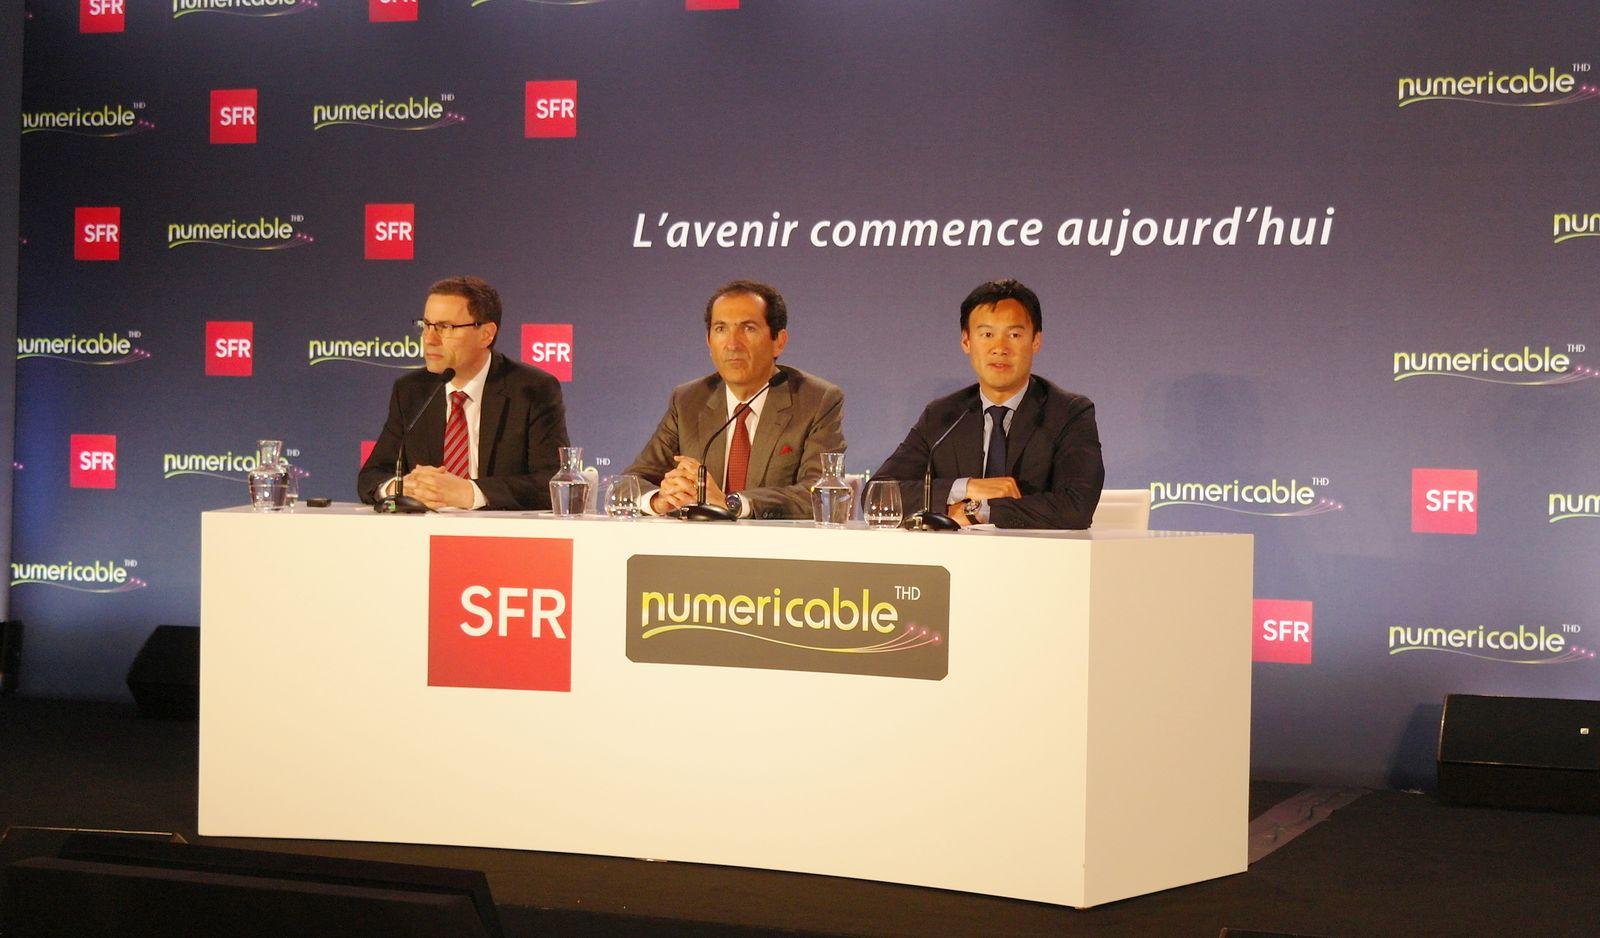 La future grille tarifaire de SFR